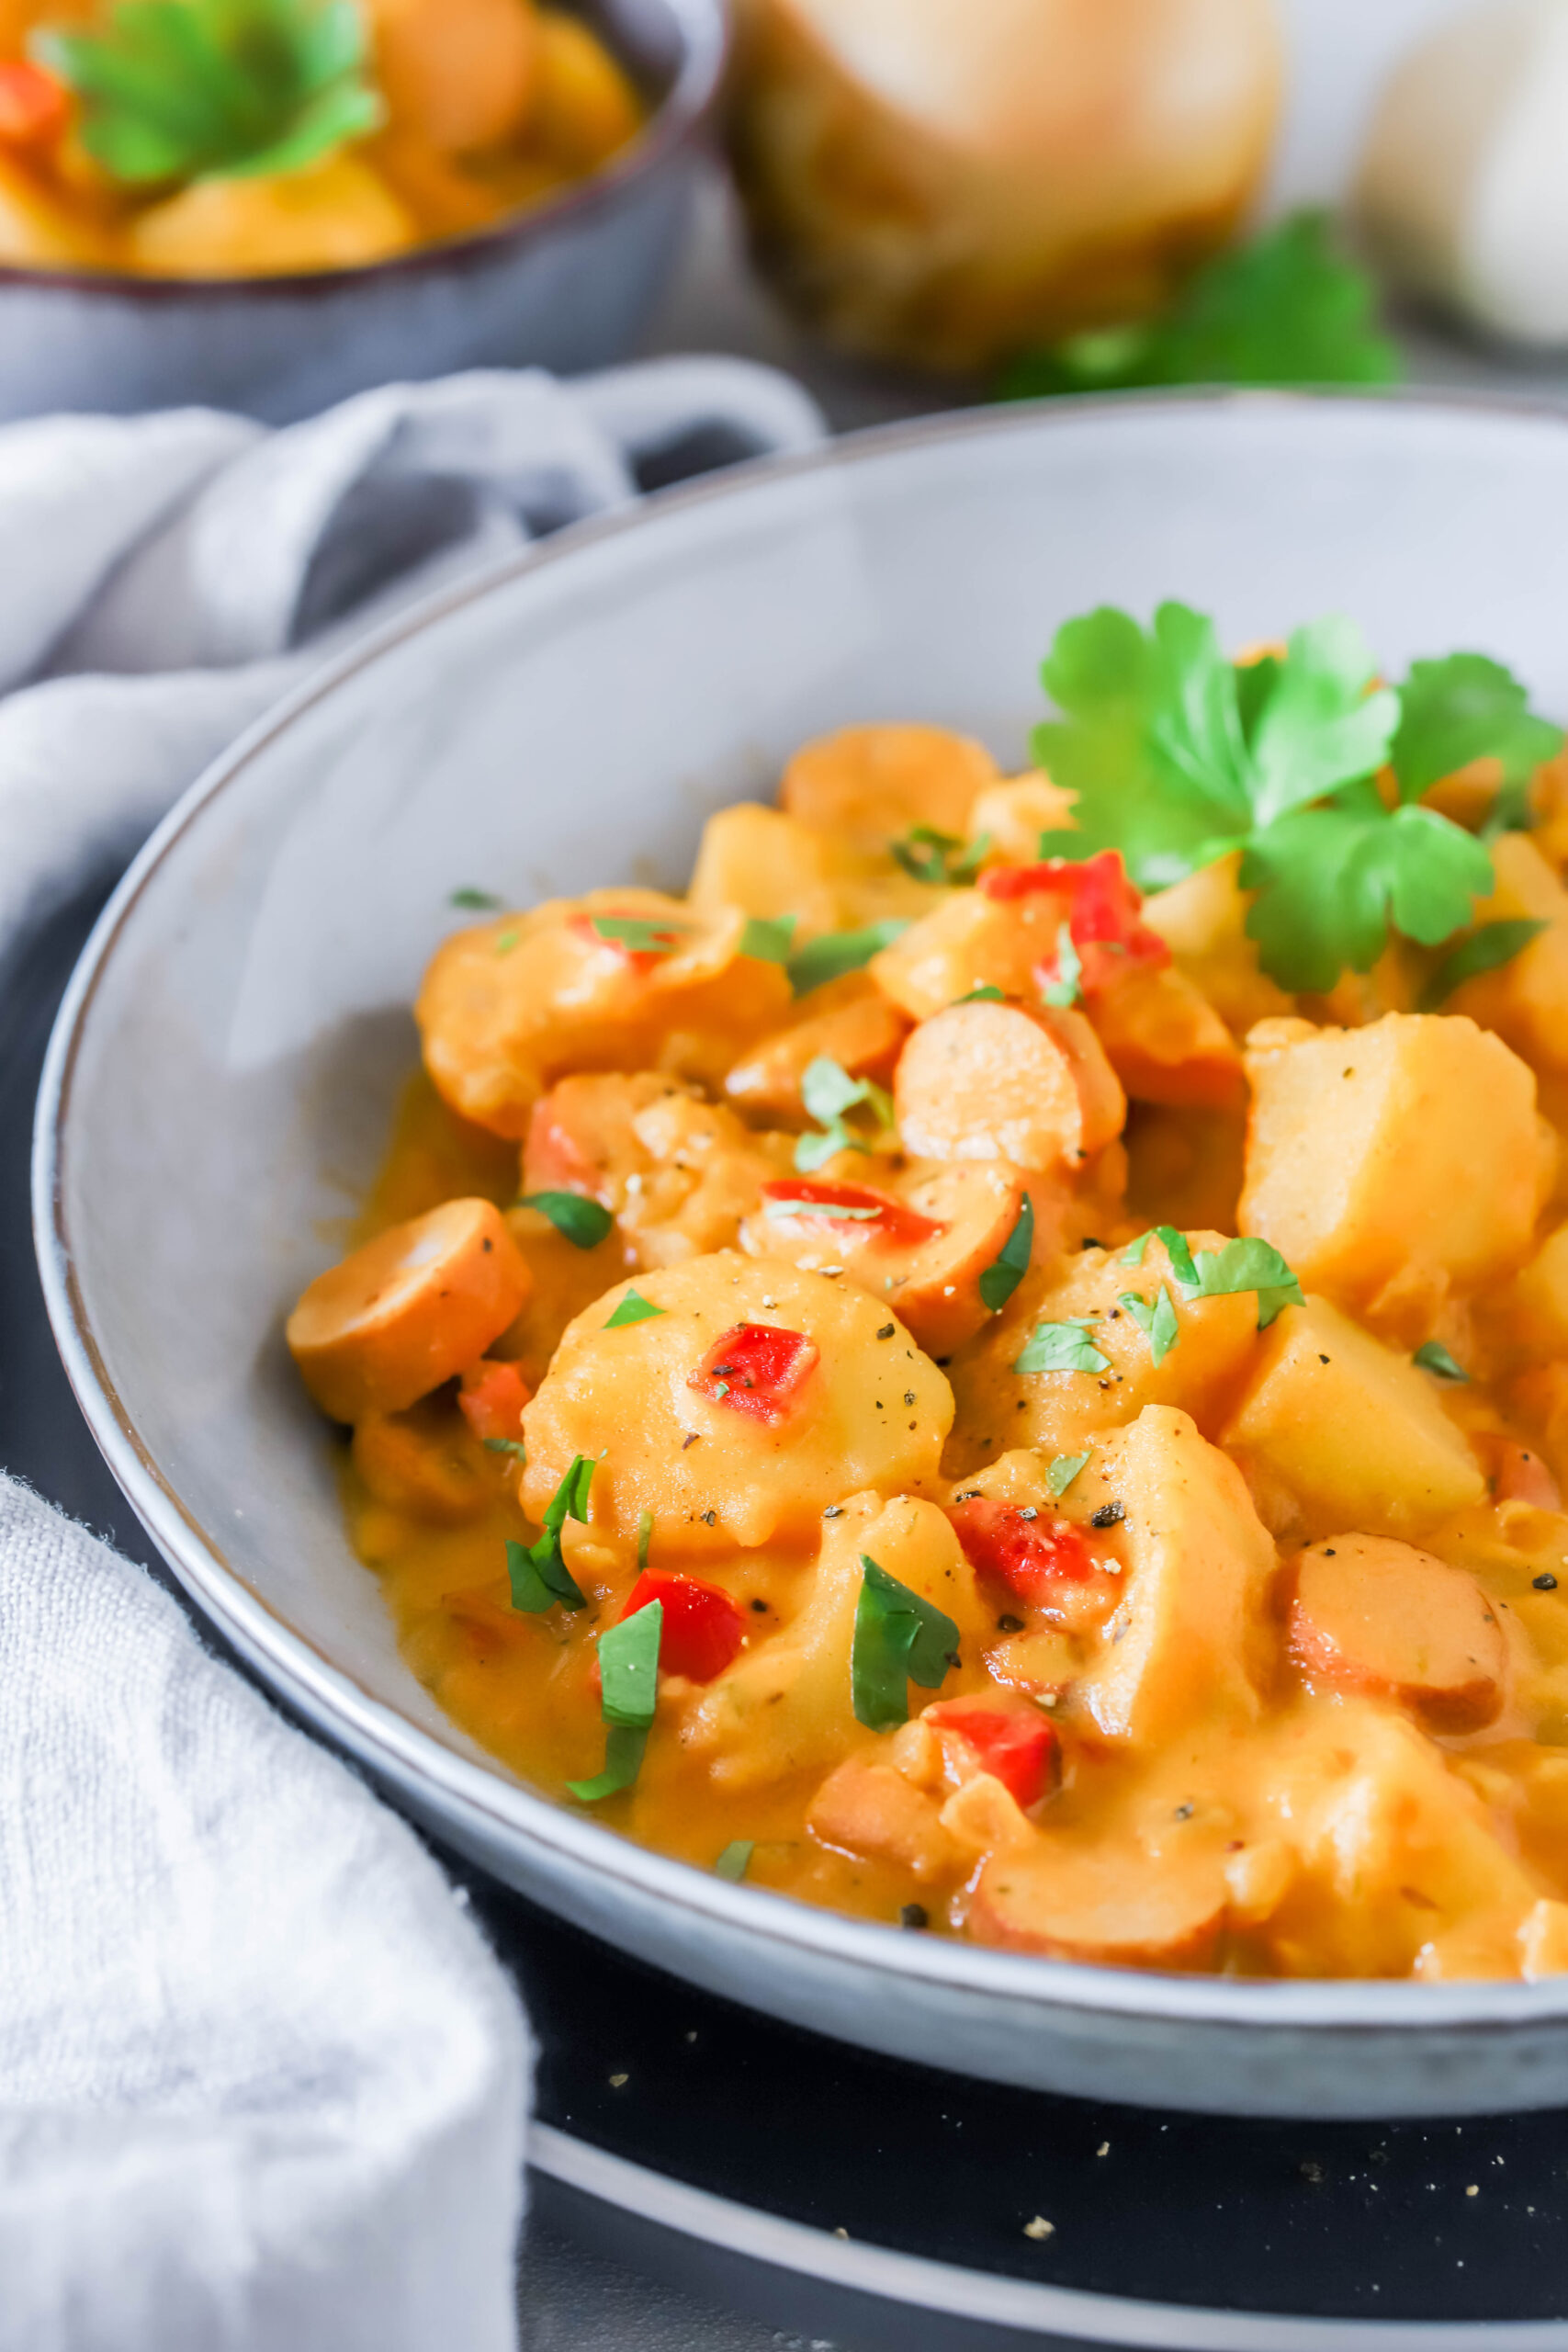 Familienessen & Soulfood: Kartoffeleintopf mit Würstchen